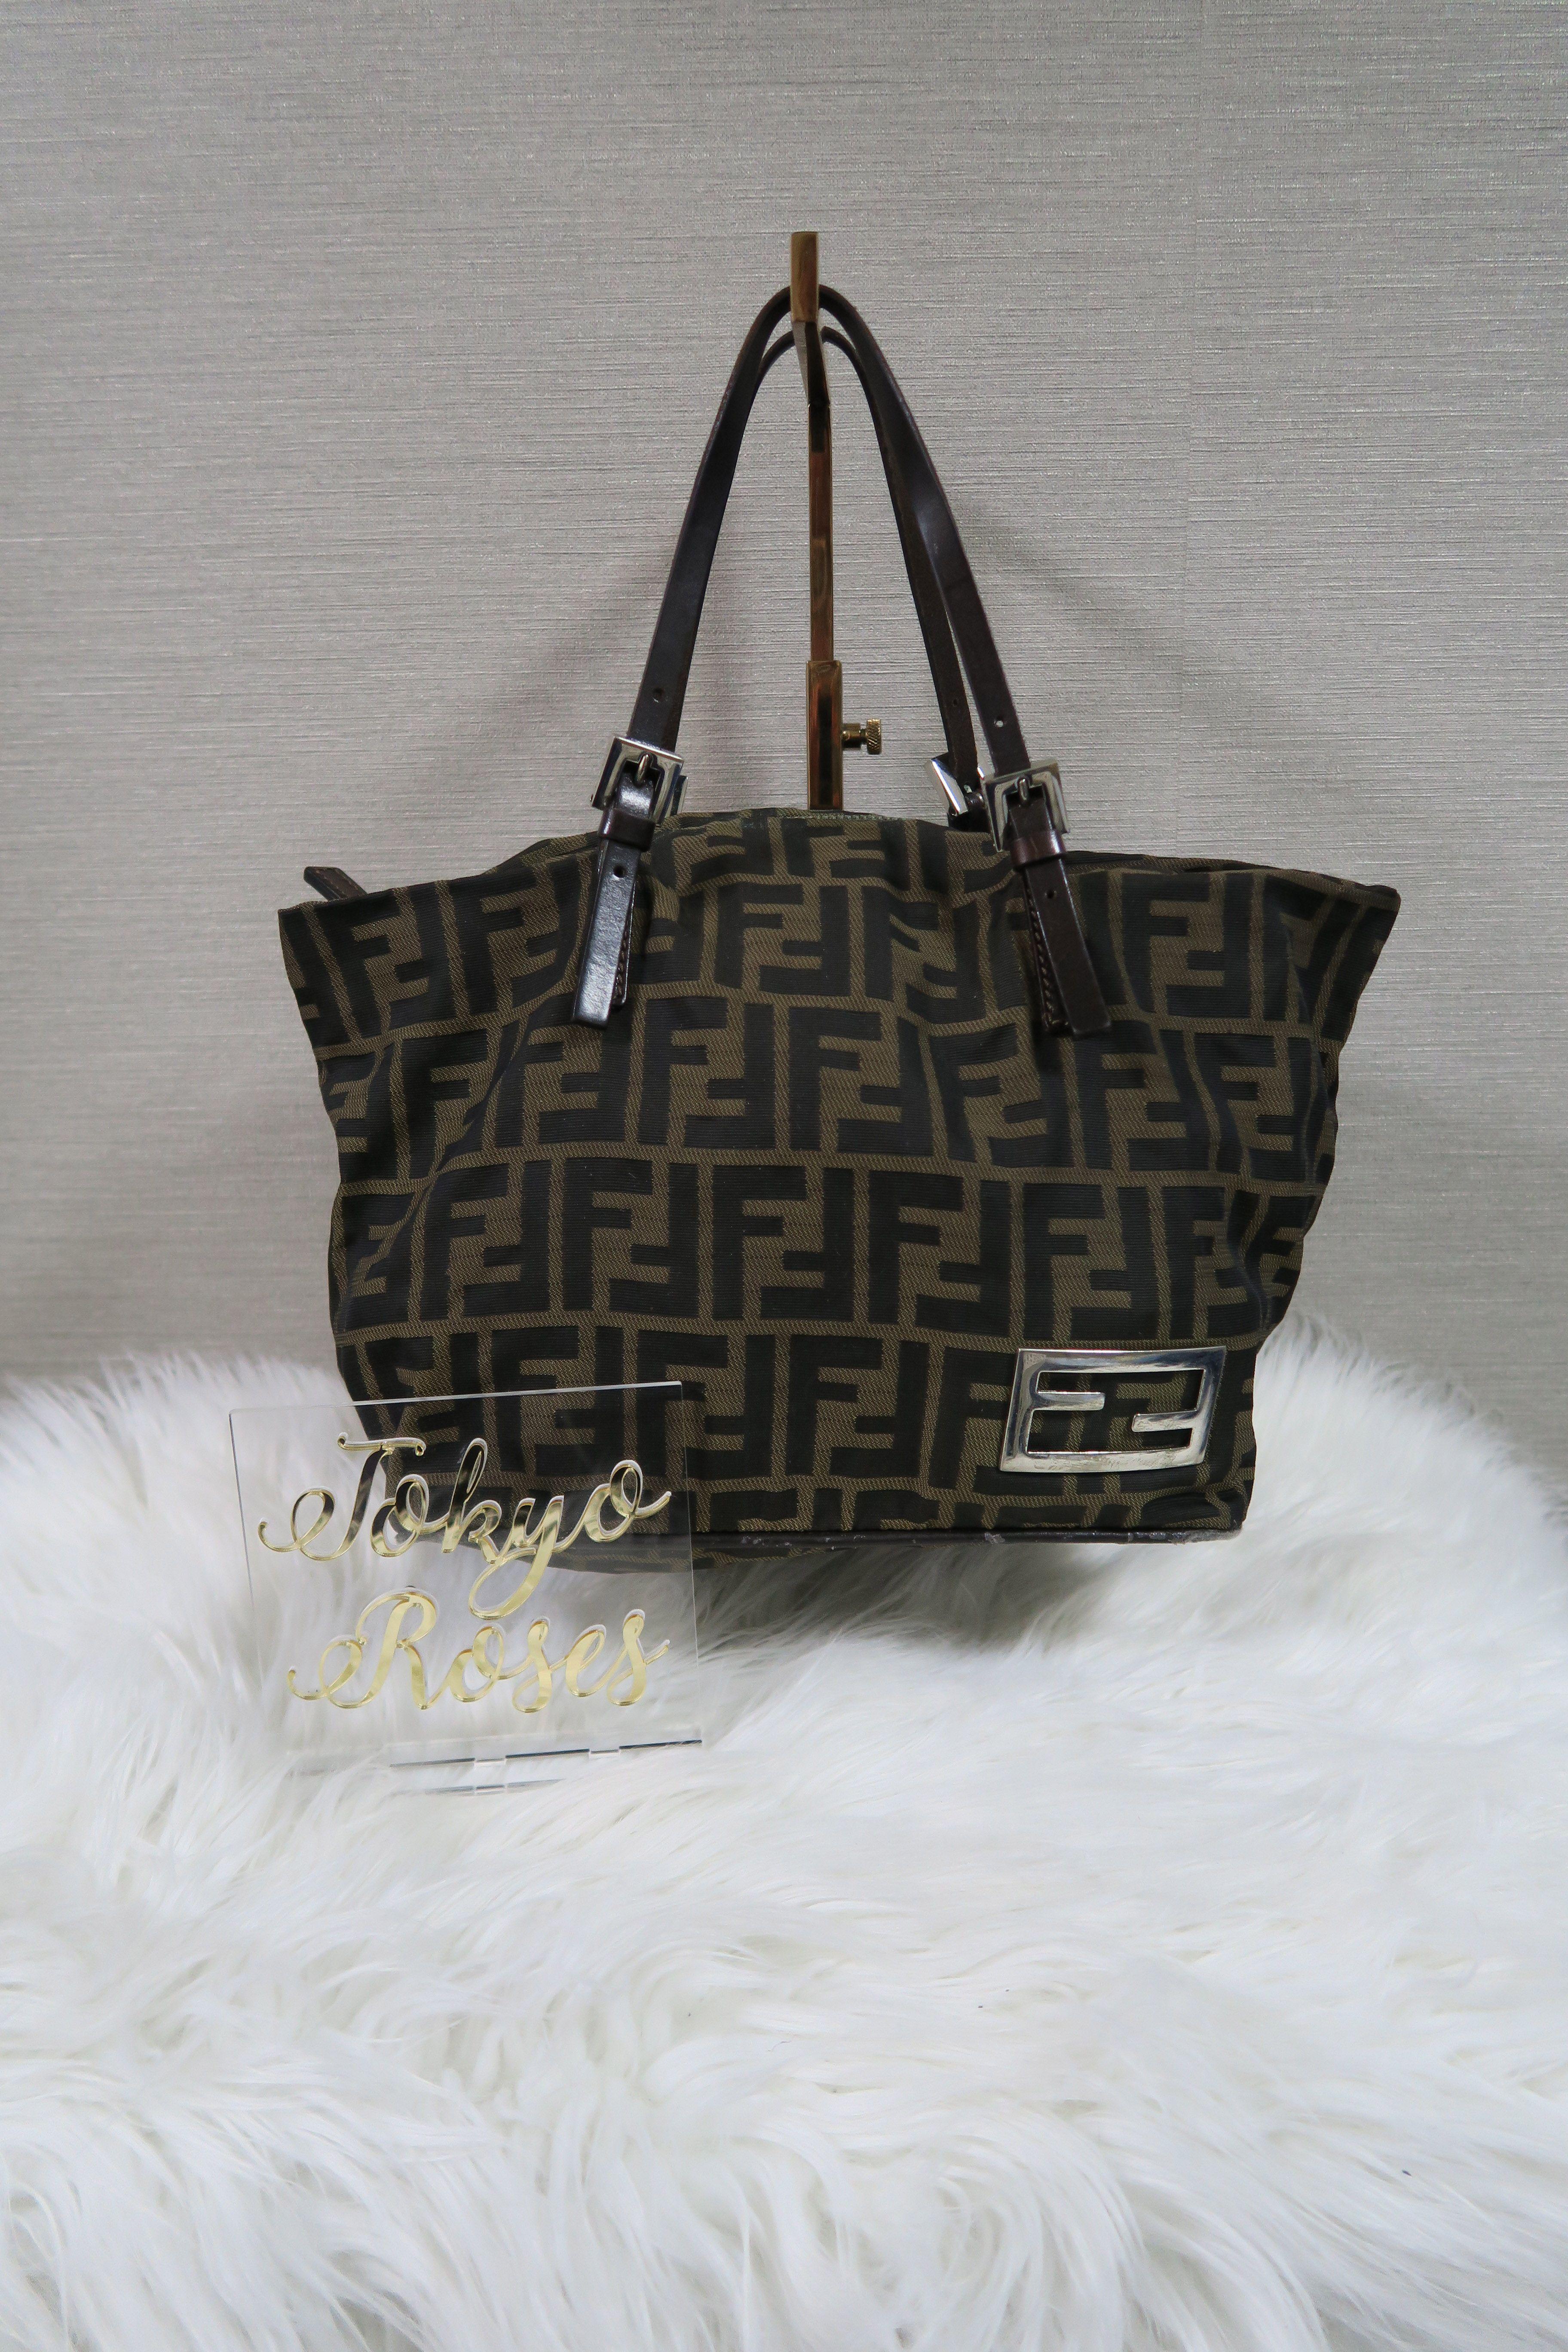 speical offer huge sale a few days away Fendi Handbag FF Logo Monogram Print Bag | Printed bags, Bags, Fendi